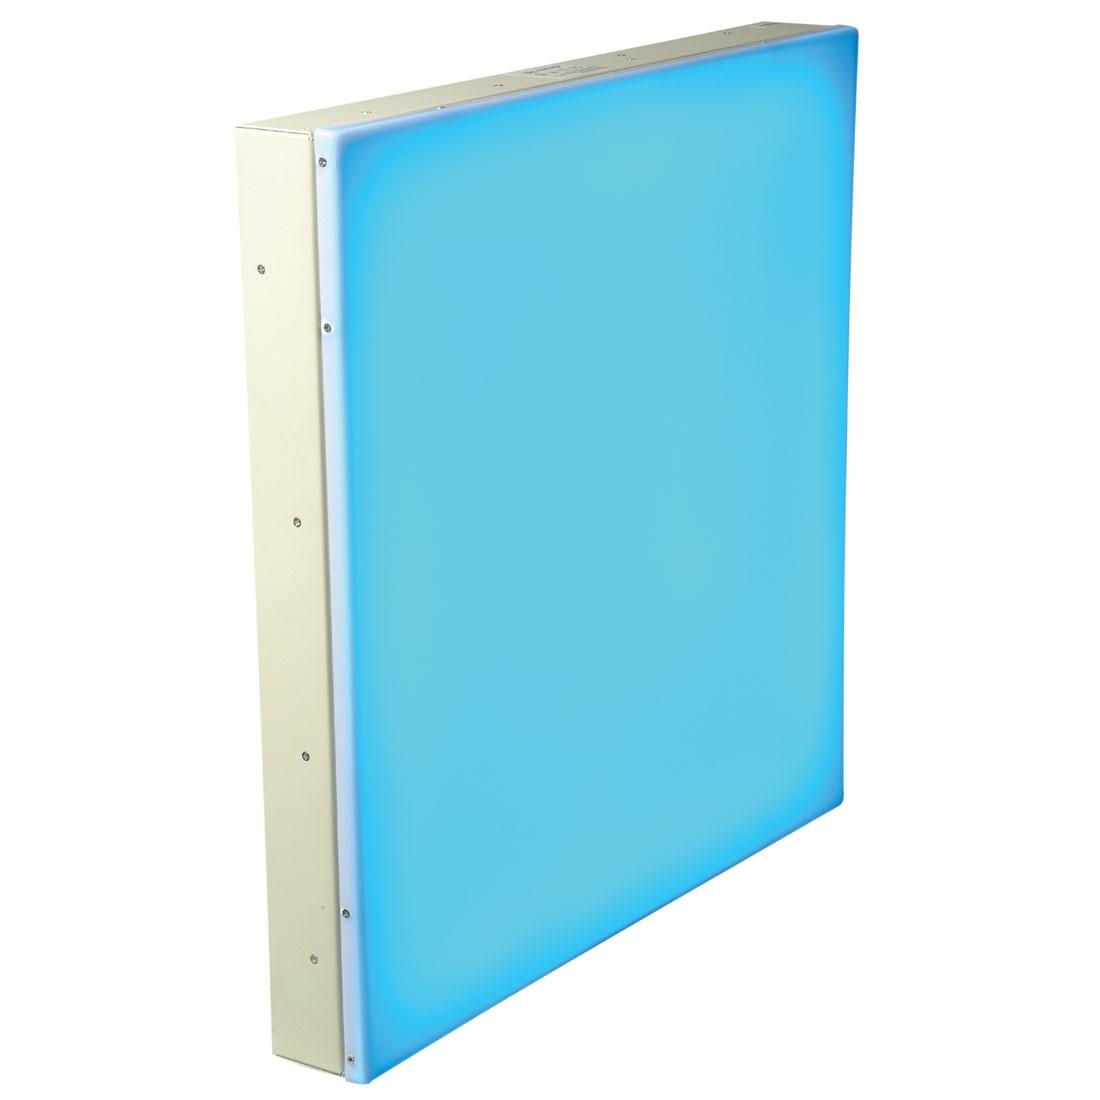 LED CUBE - LED panel